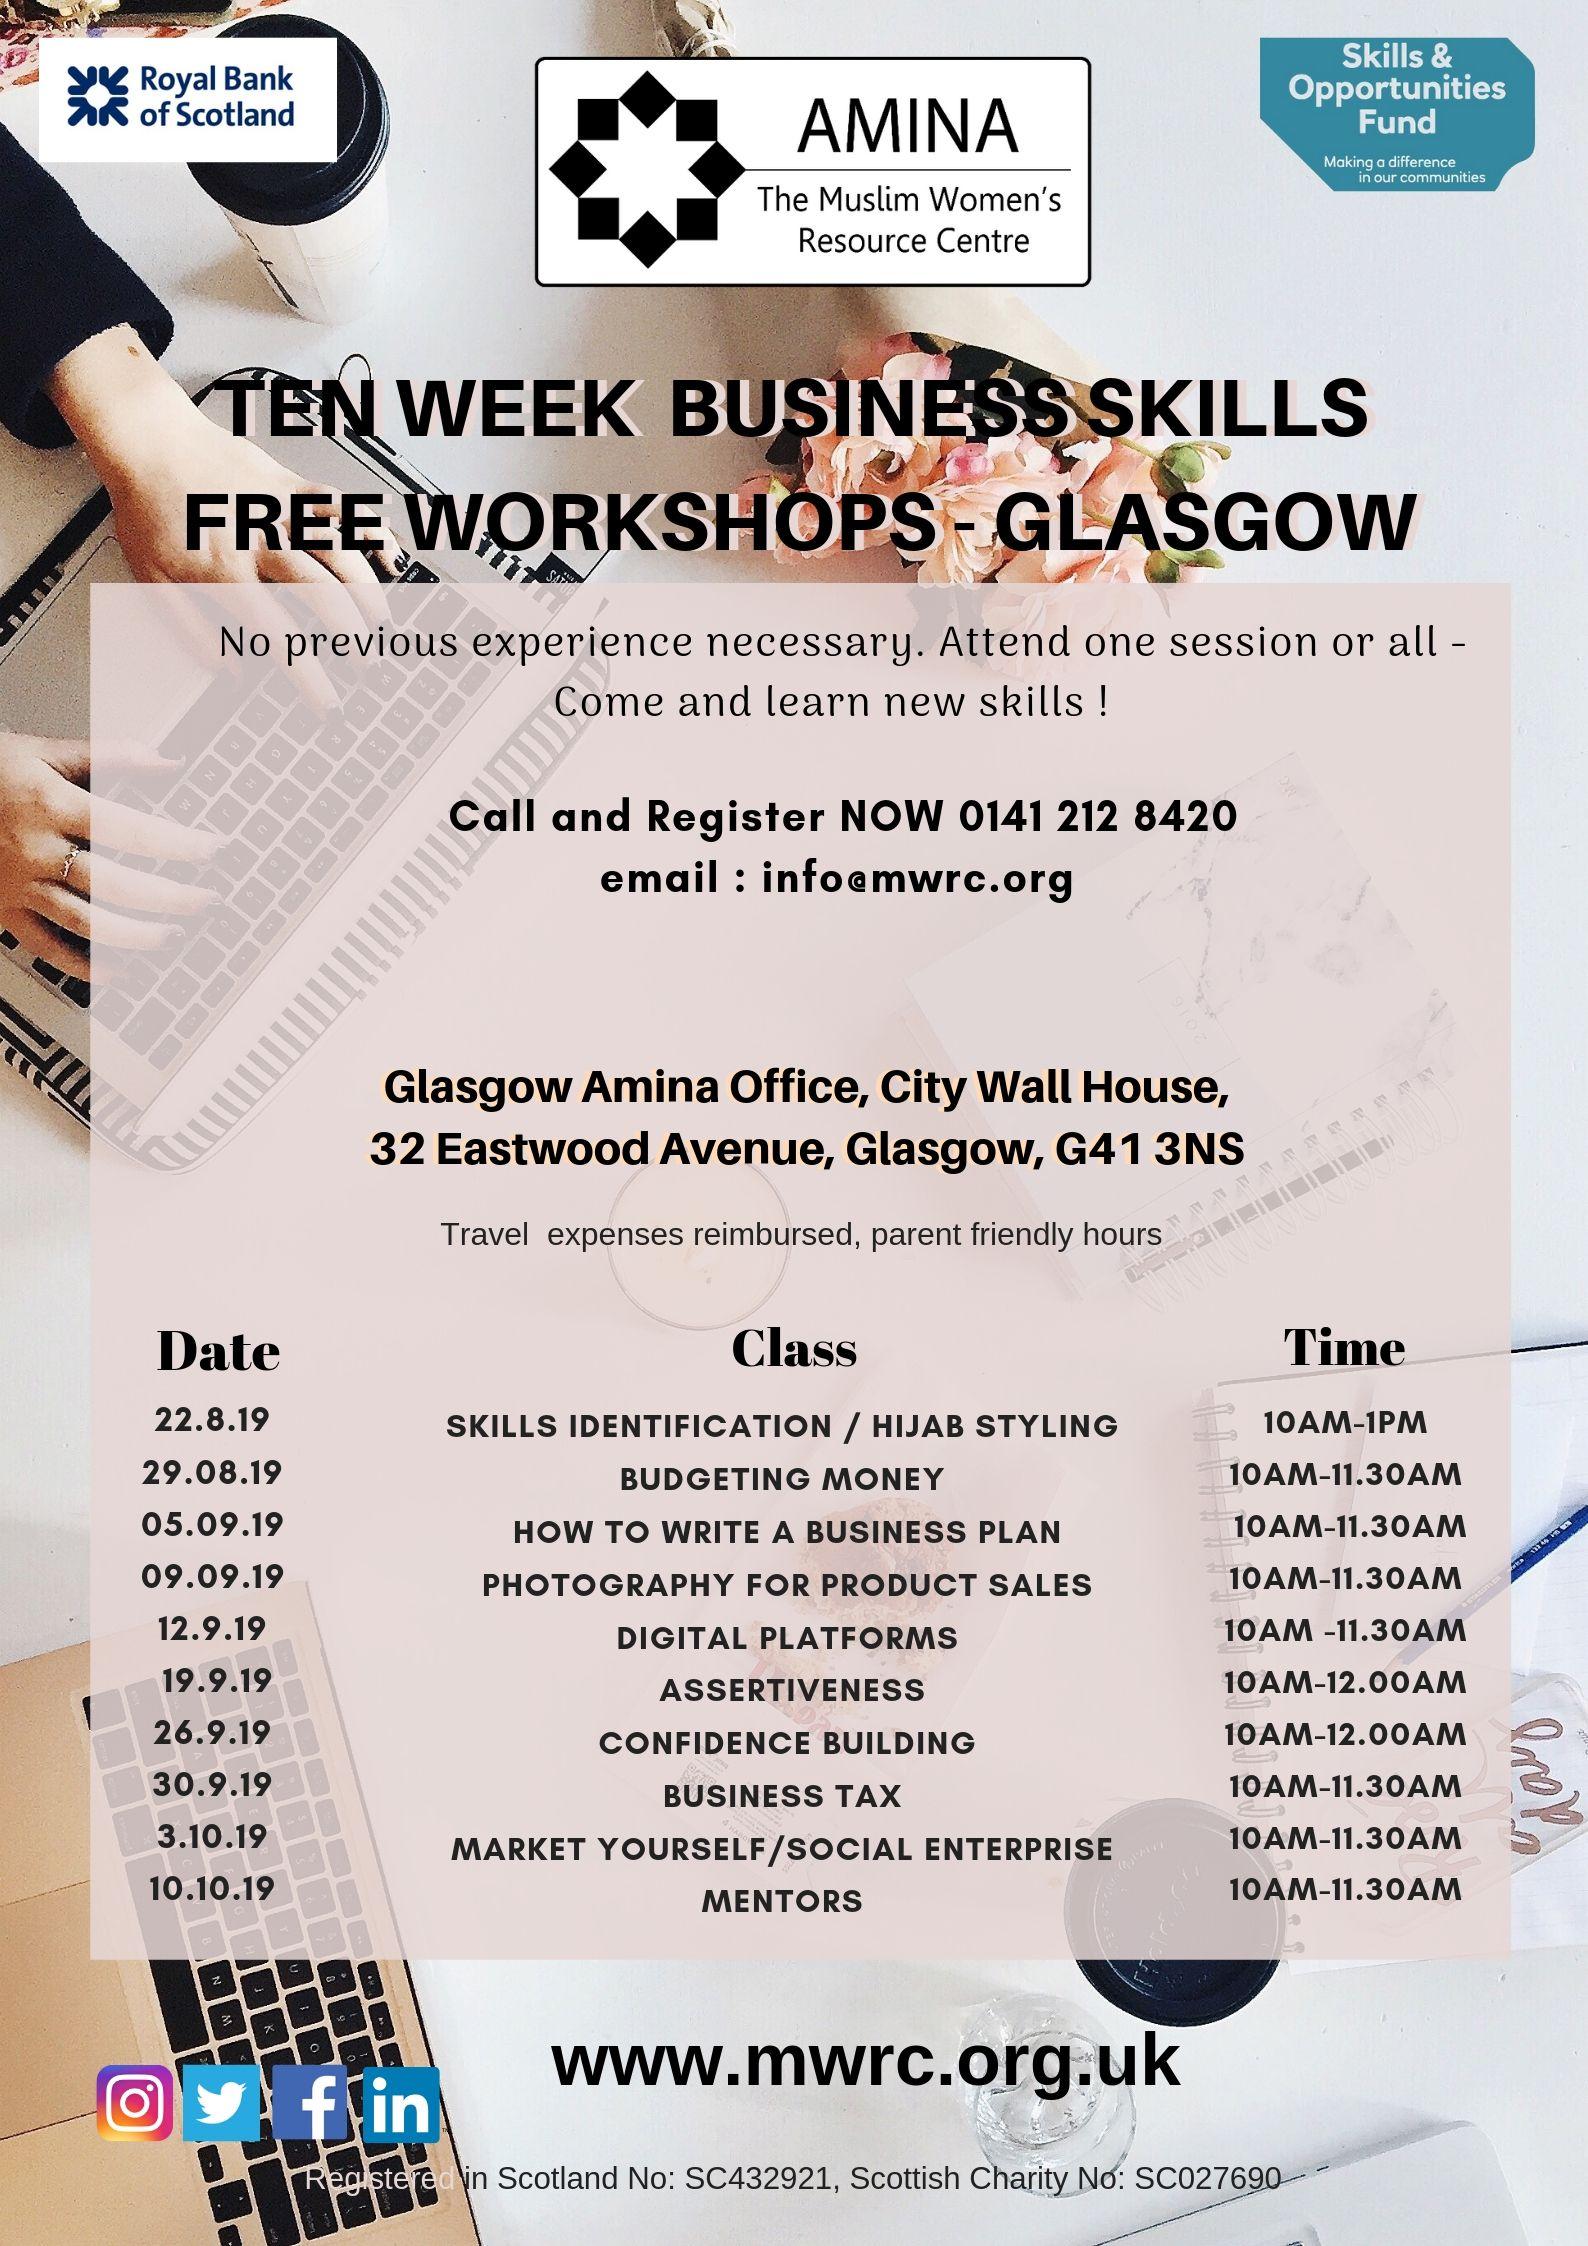 10-week Business Skills Workshops - Glasgow